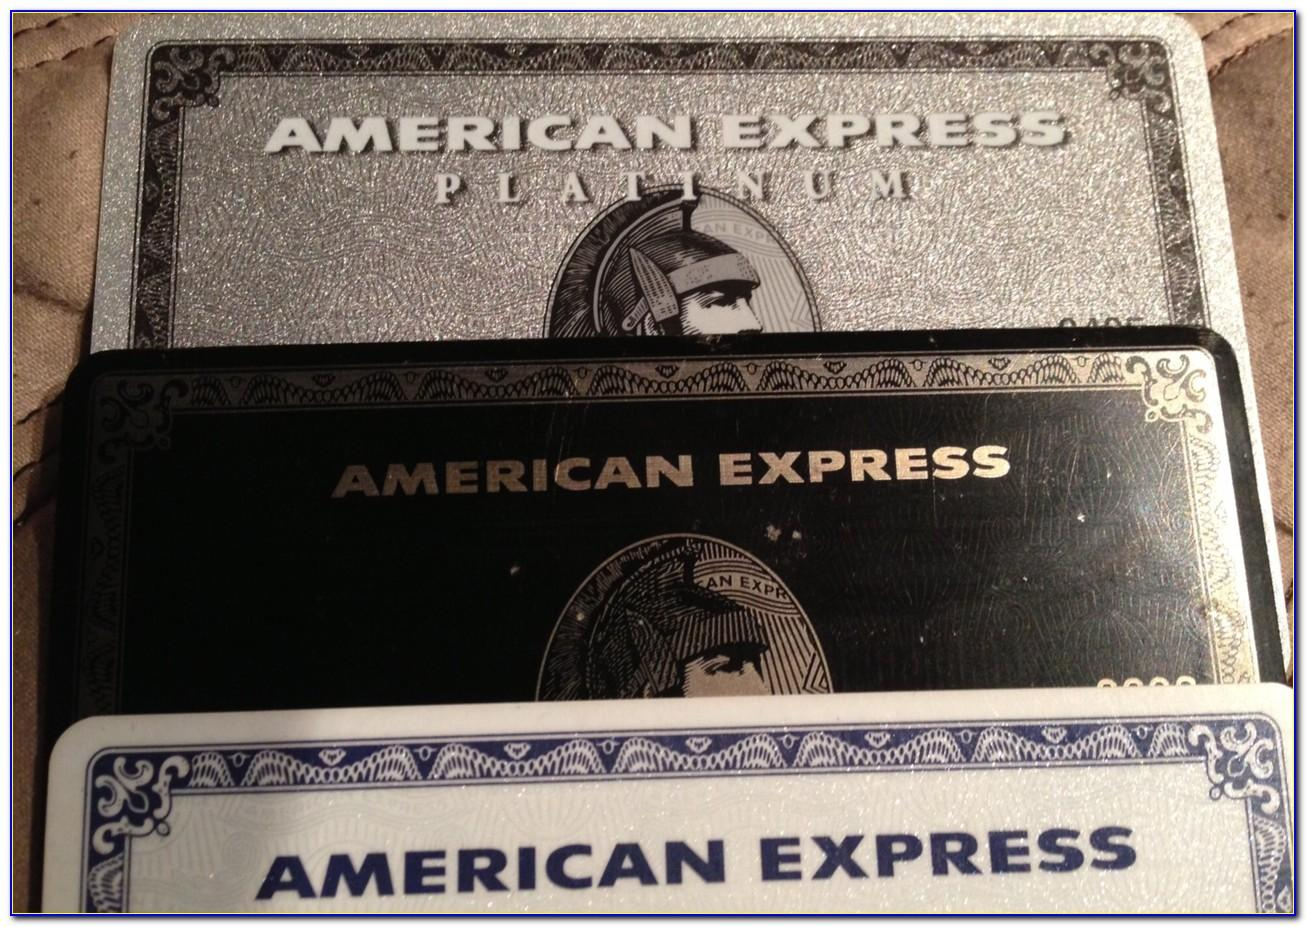 Amex Business Platinum Additional Card Fee